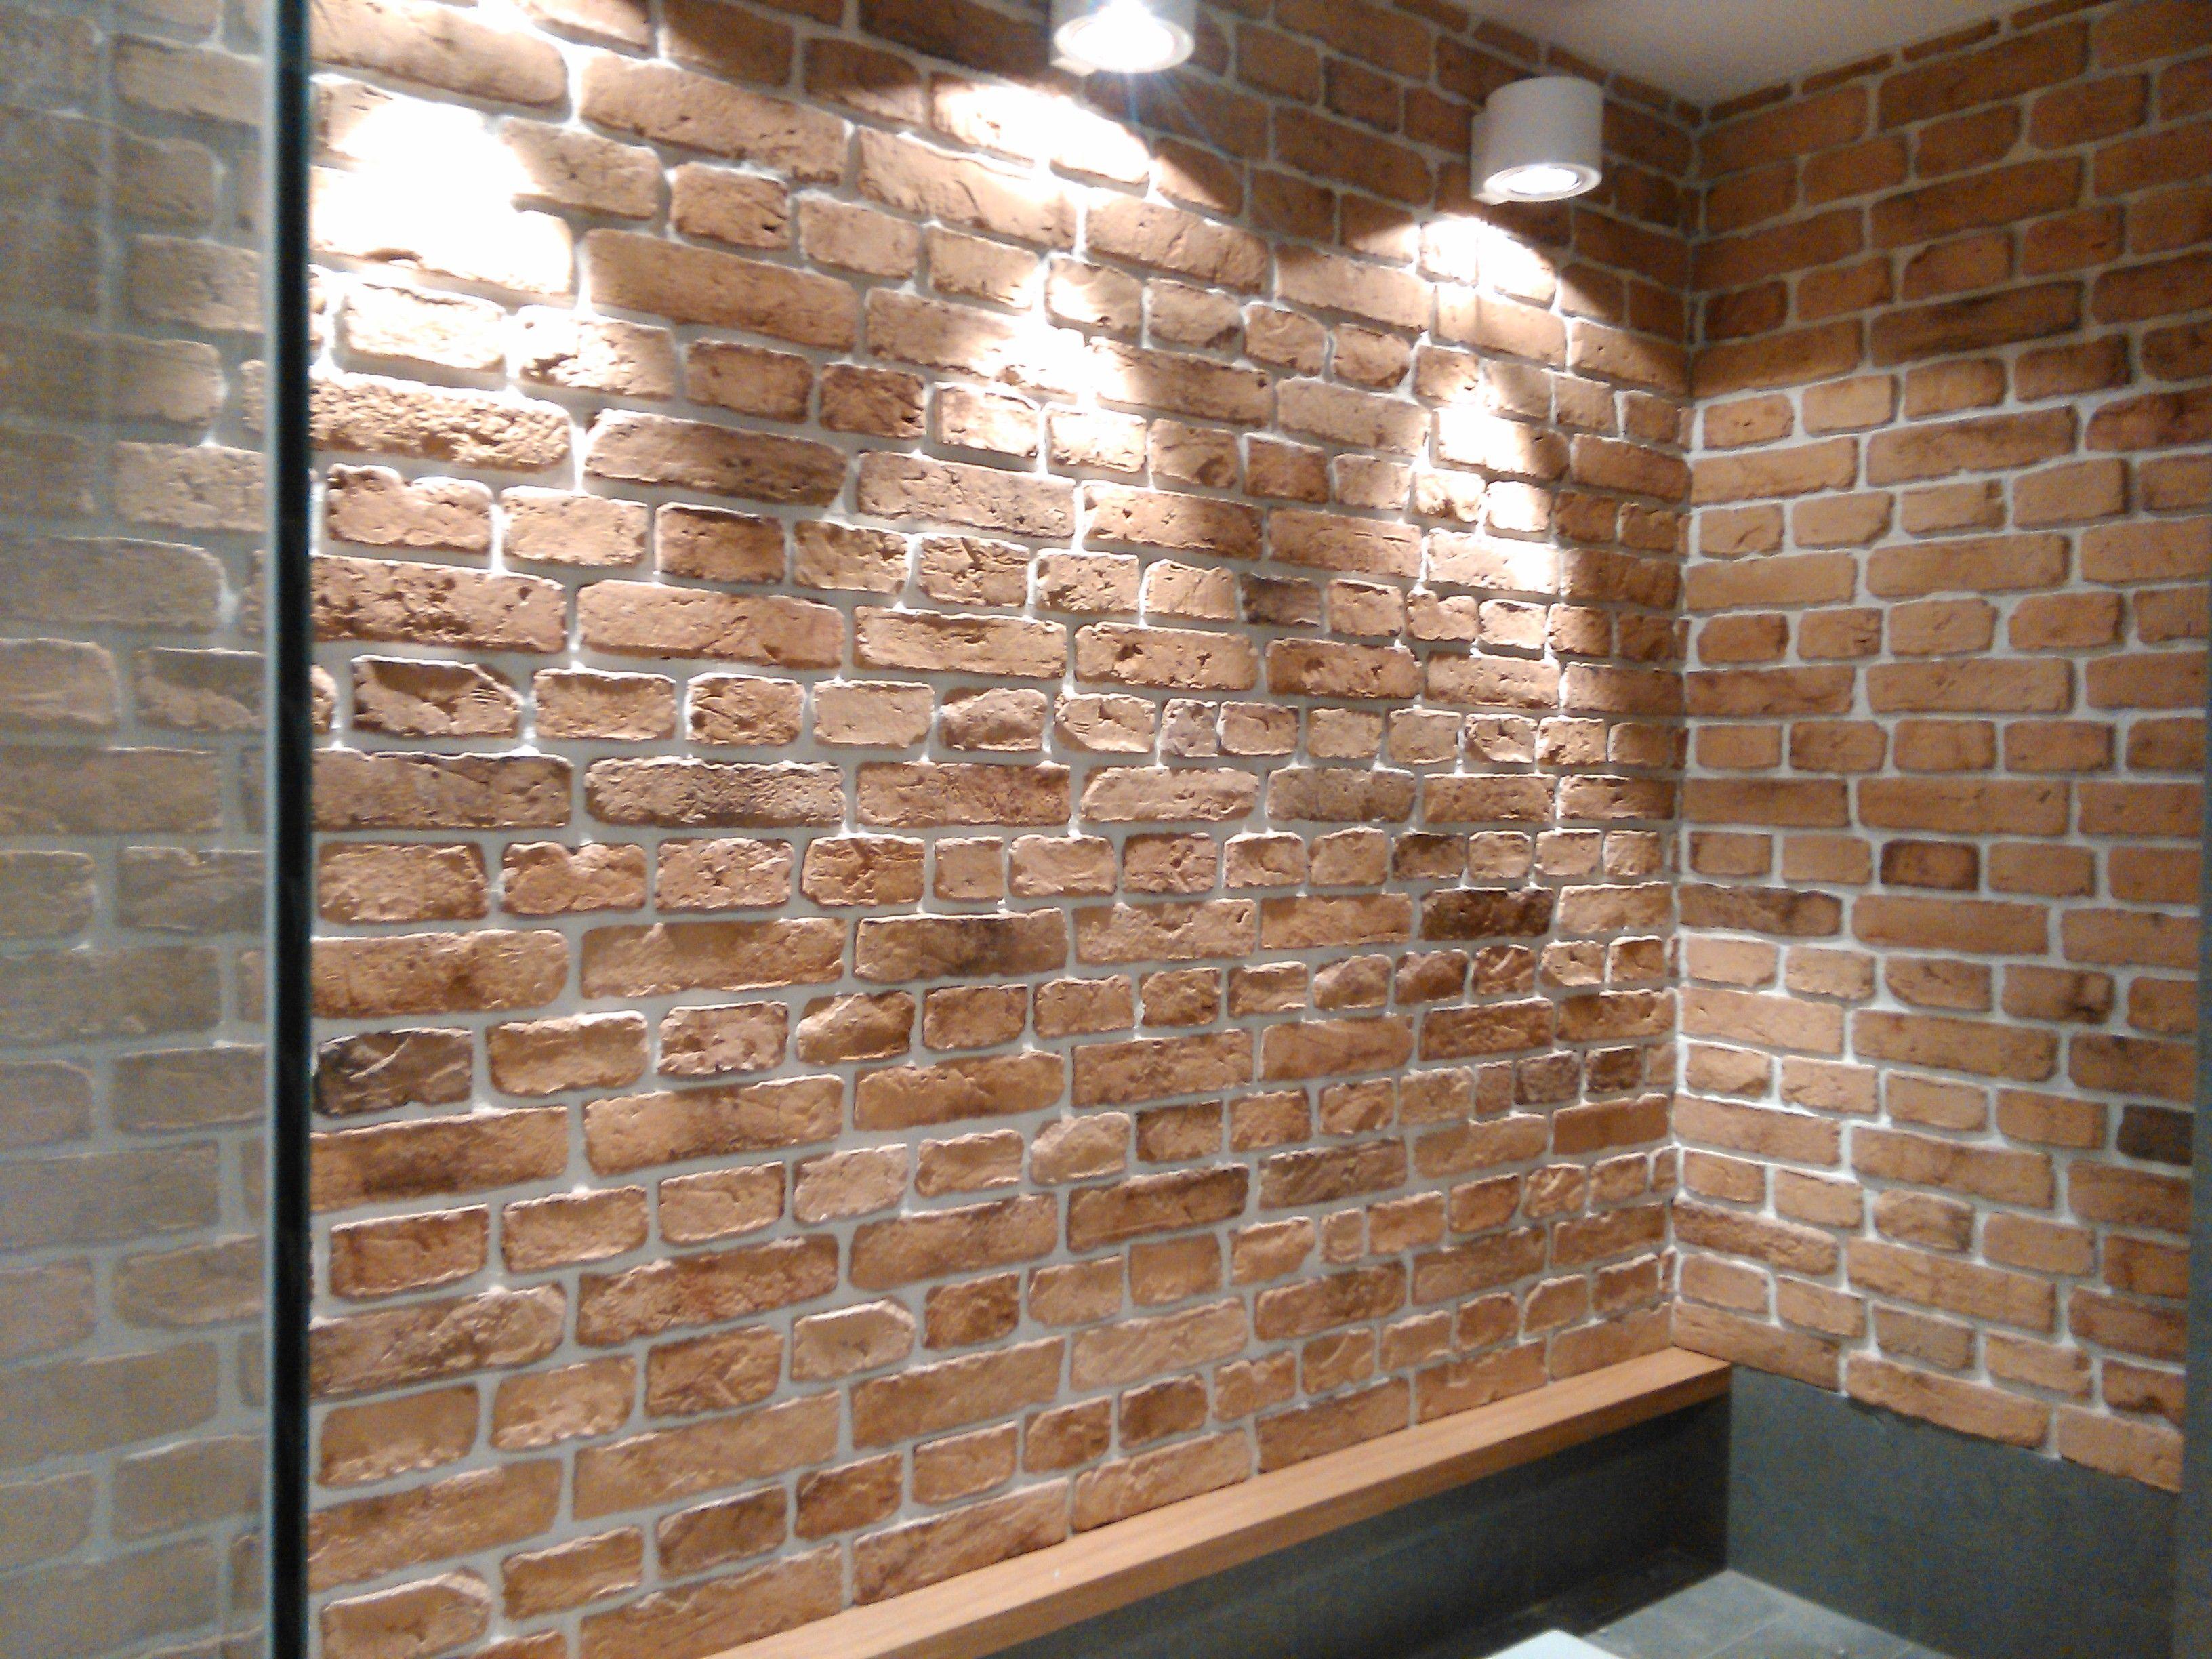 3d Wallpaper Or Wall Panel Or Wall Panels Stacked Stone Brick Veneers Cladding Alternative Brick Wall